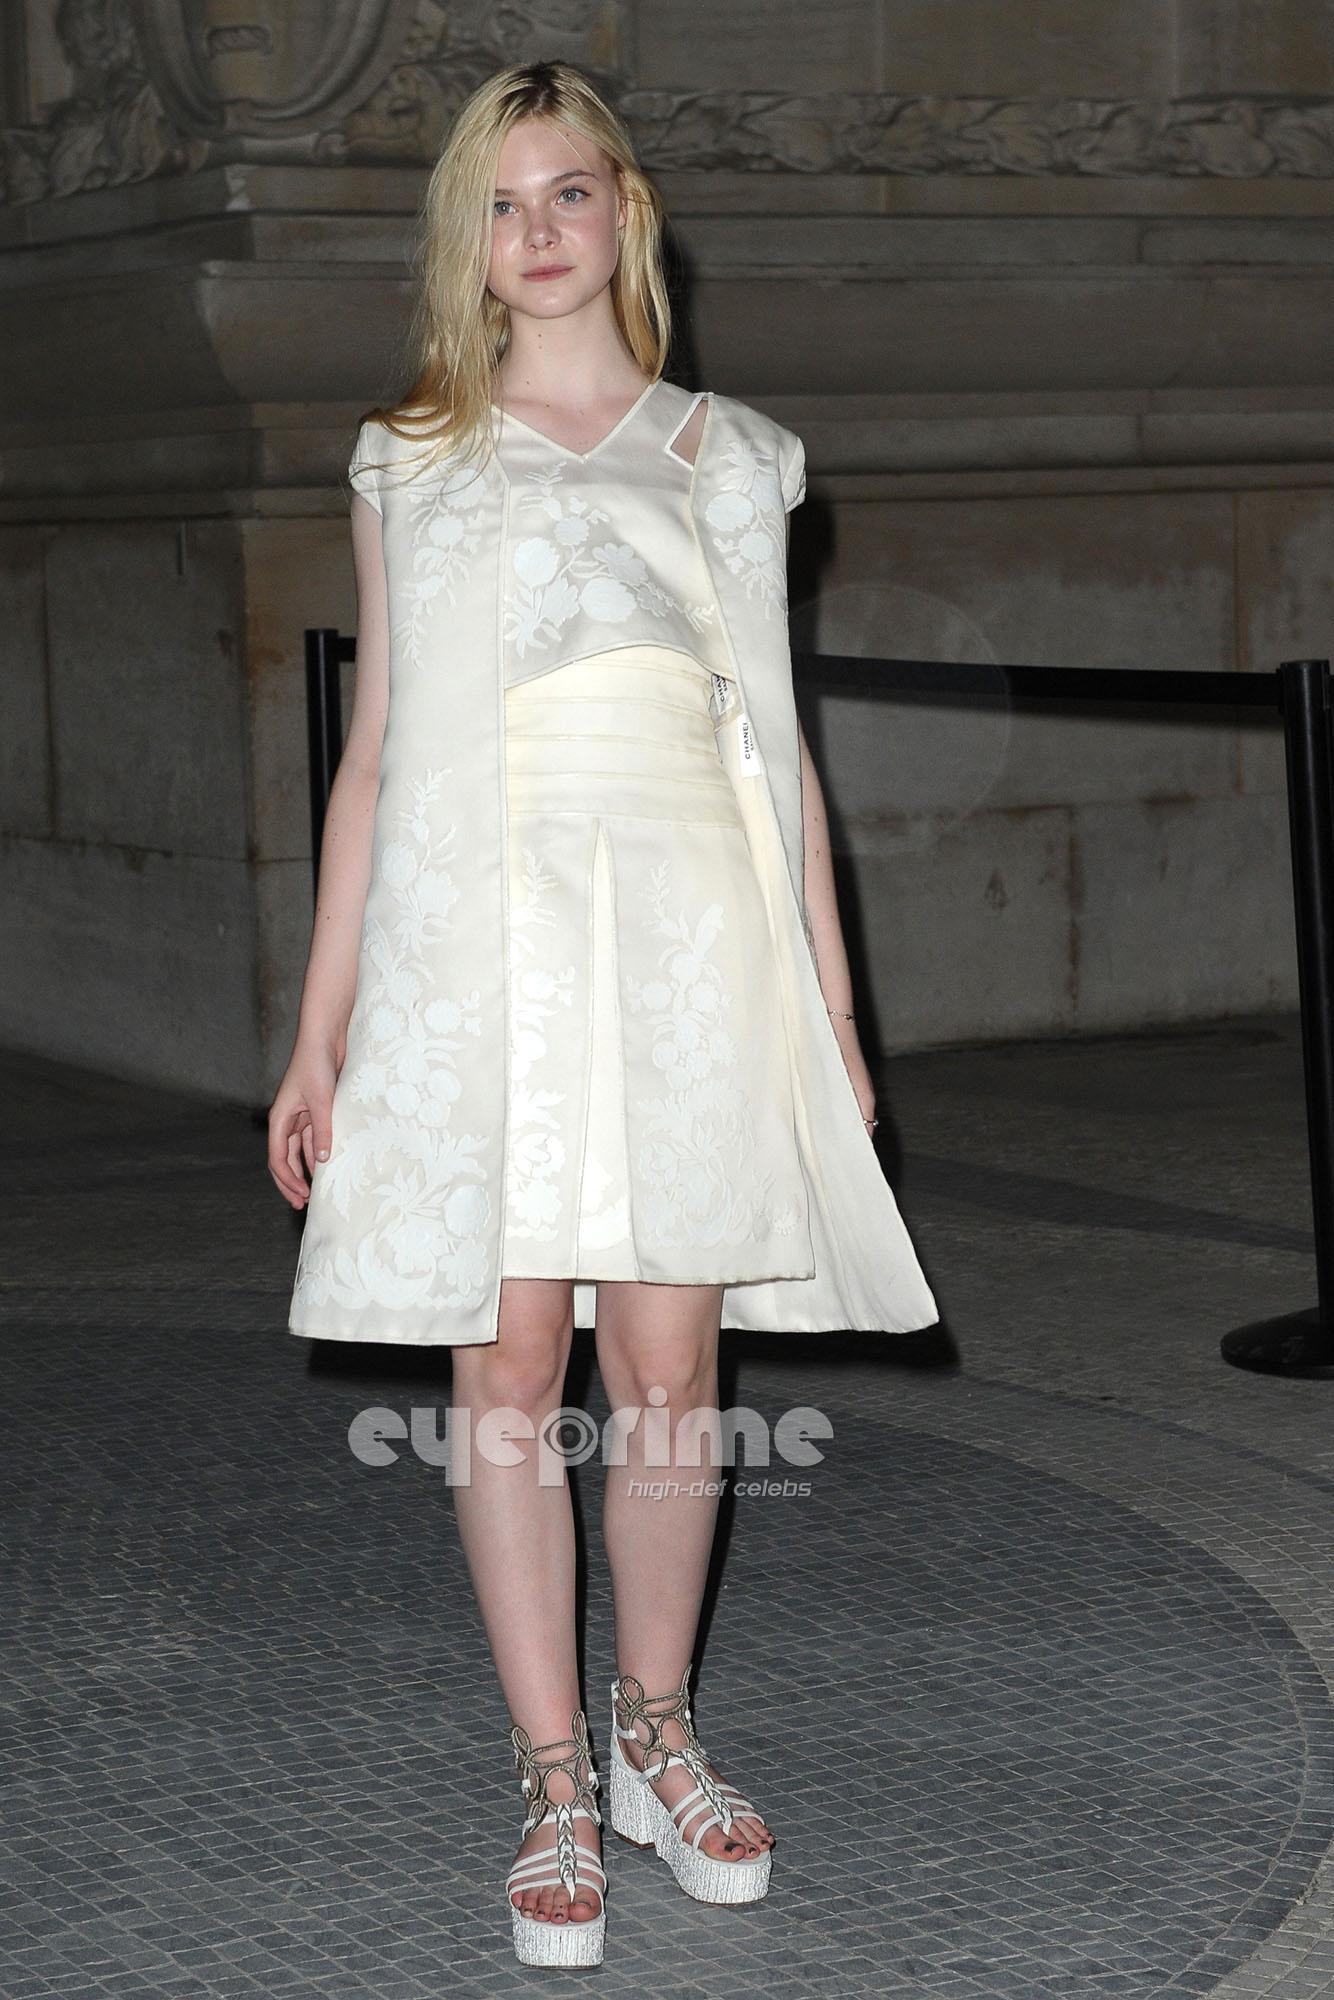 Elle Fanning: Chanel Fashion Показать in Paris, July 5